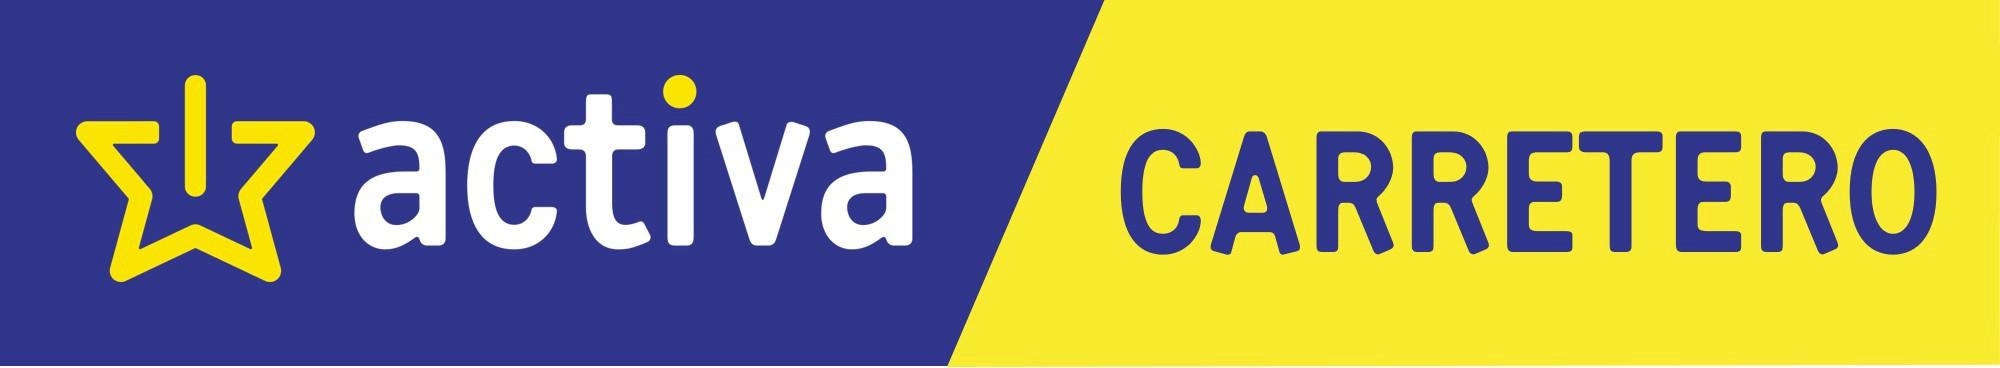 Logo Electrodomésticos Carretero